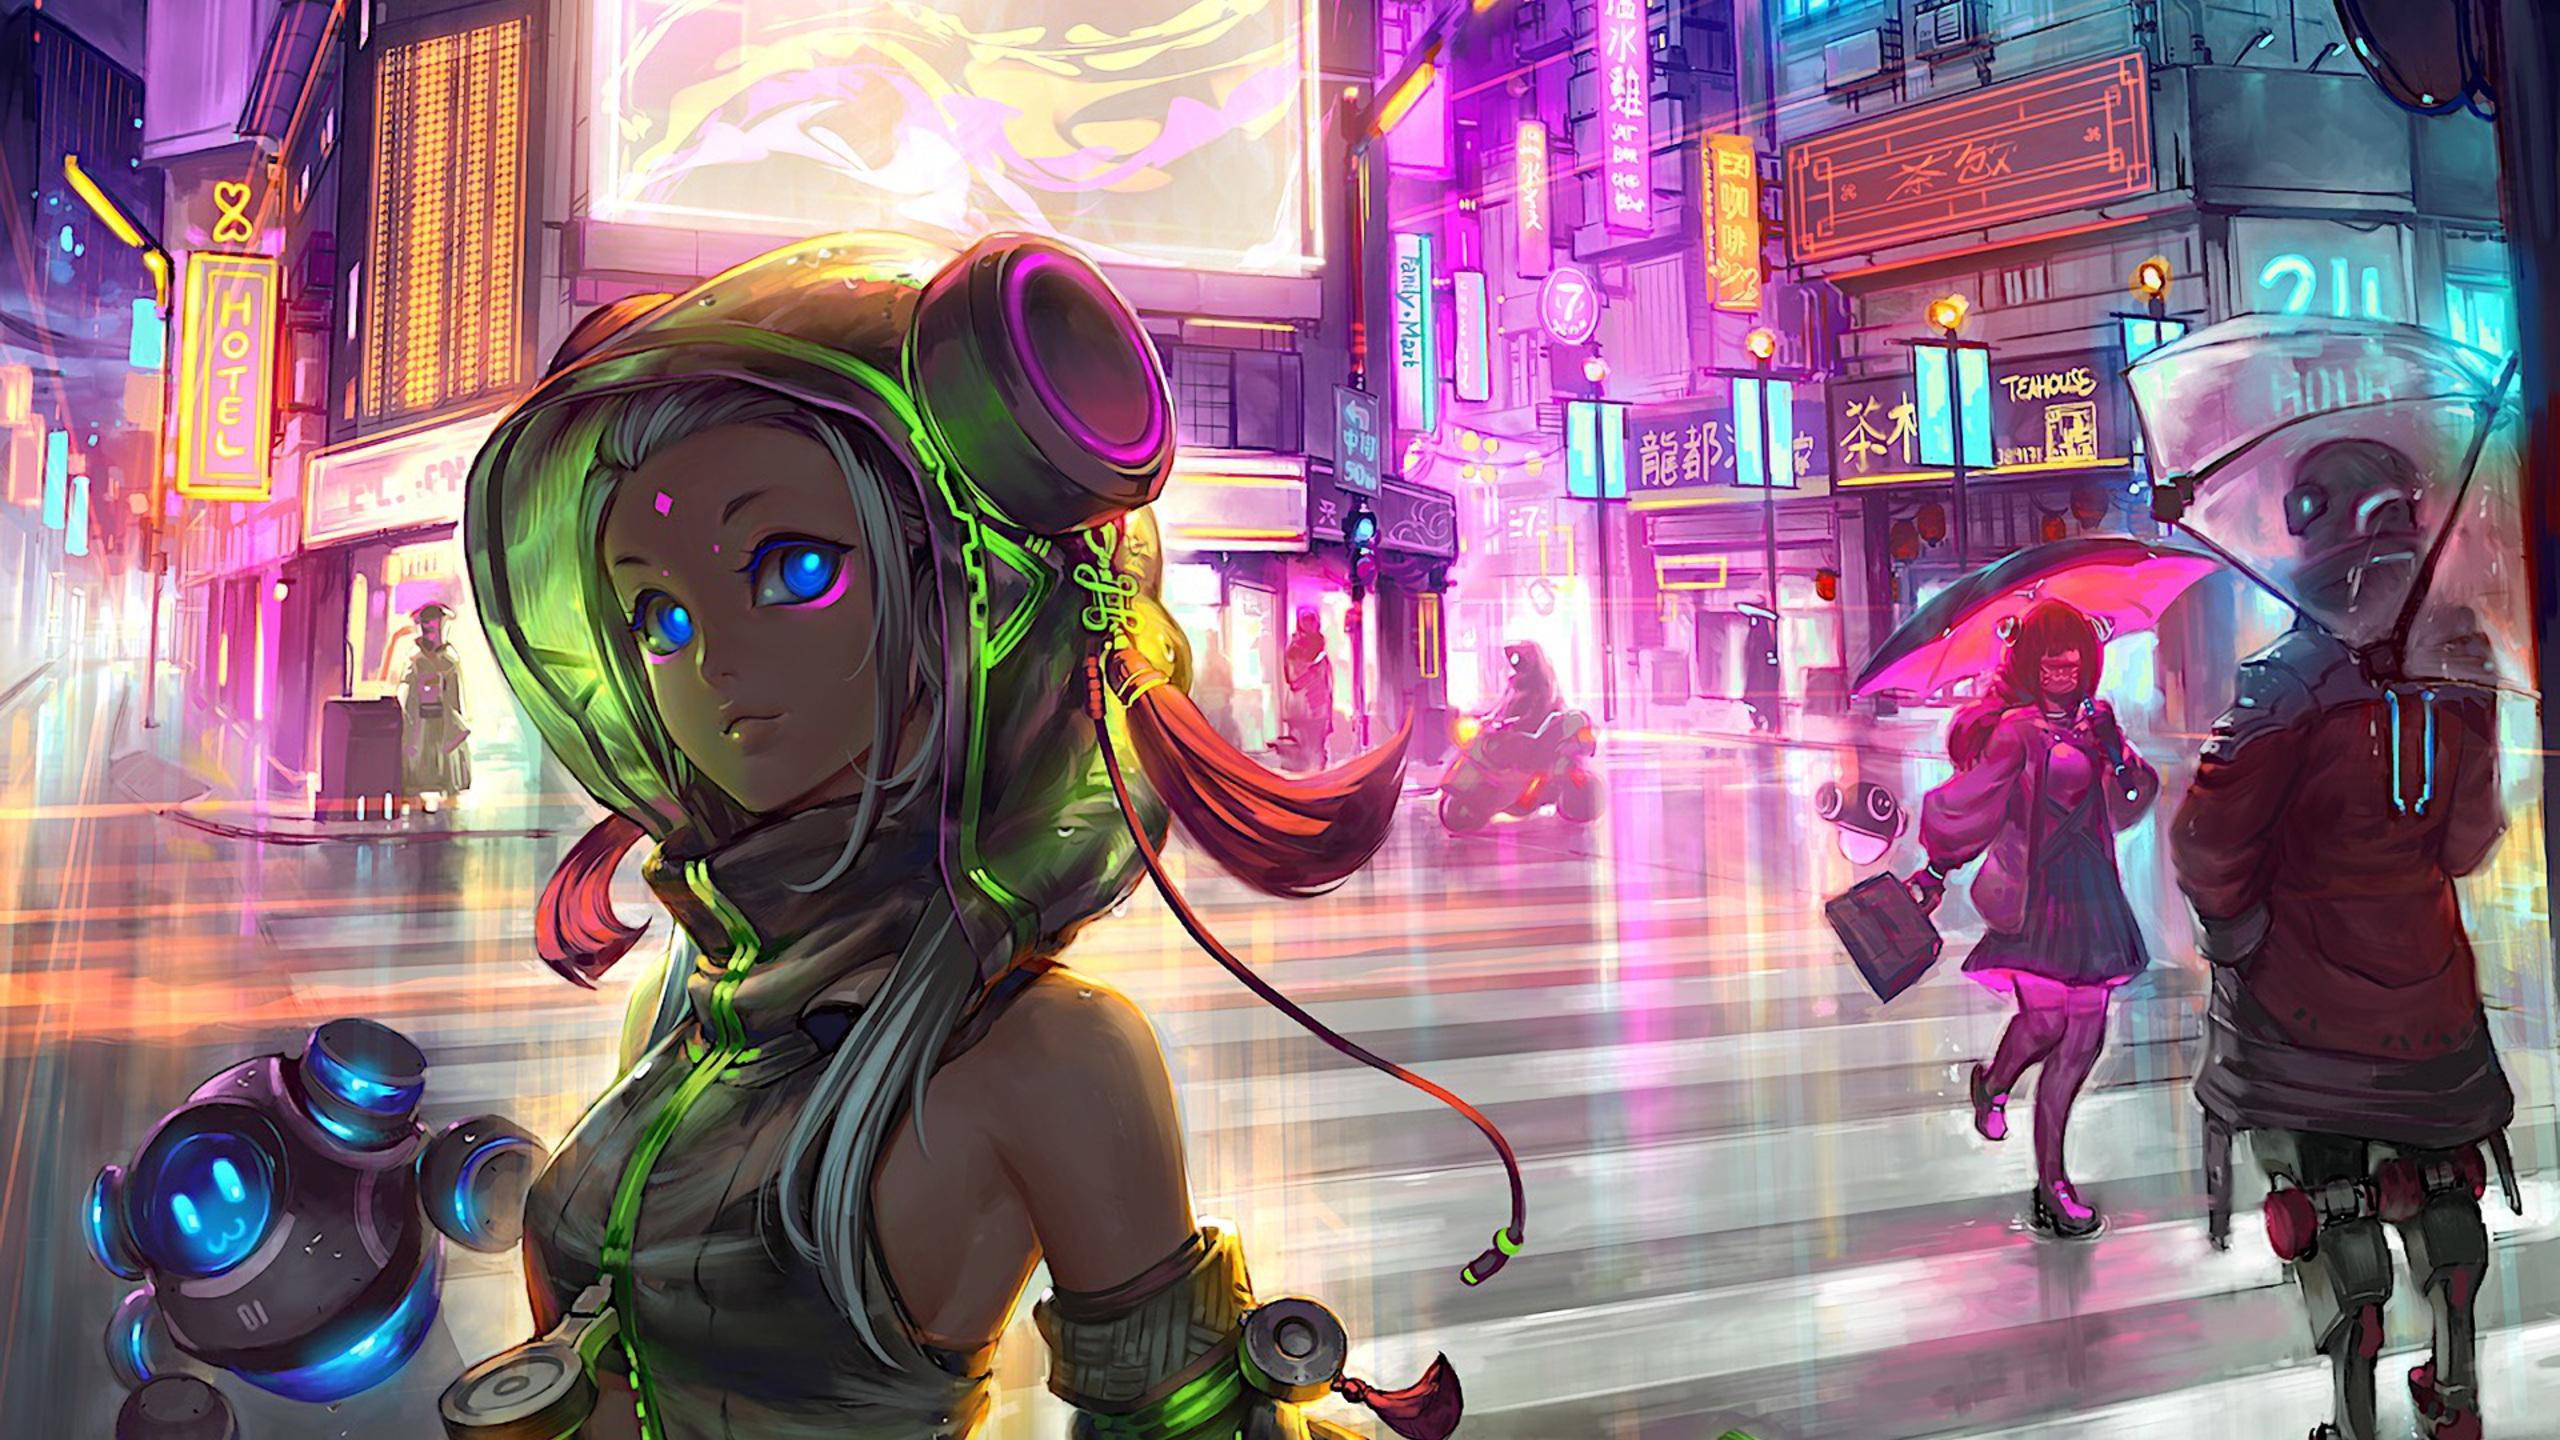 Anime Cyberpunk Scifi City Ow Jpg